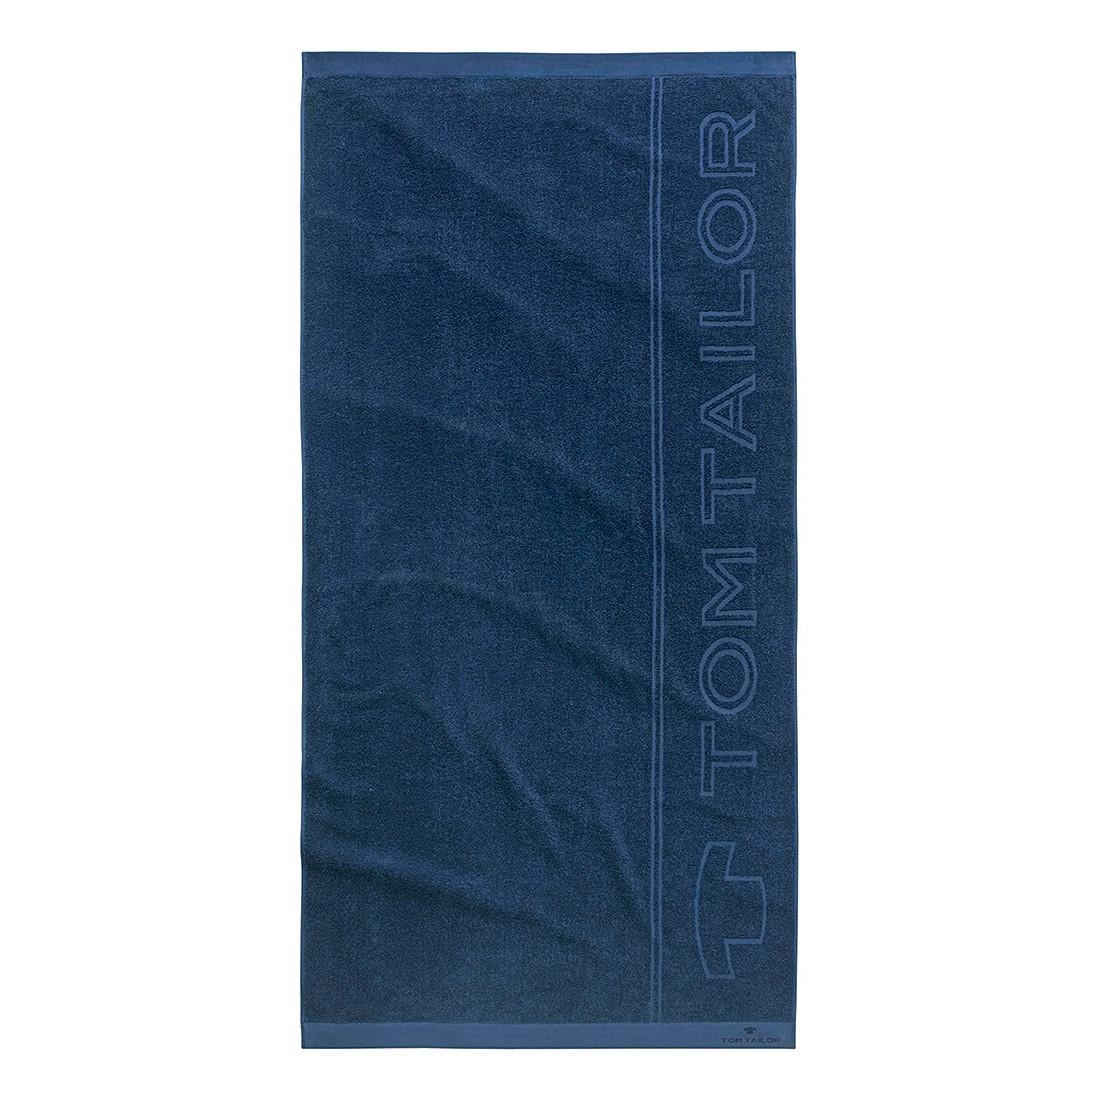 Home 24 - Serviette beach towels - bleu foncé, tom tailor